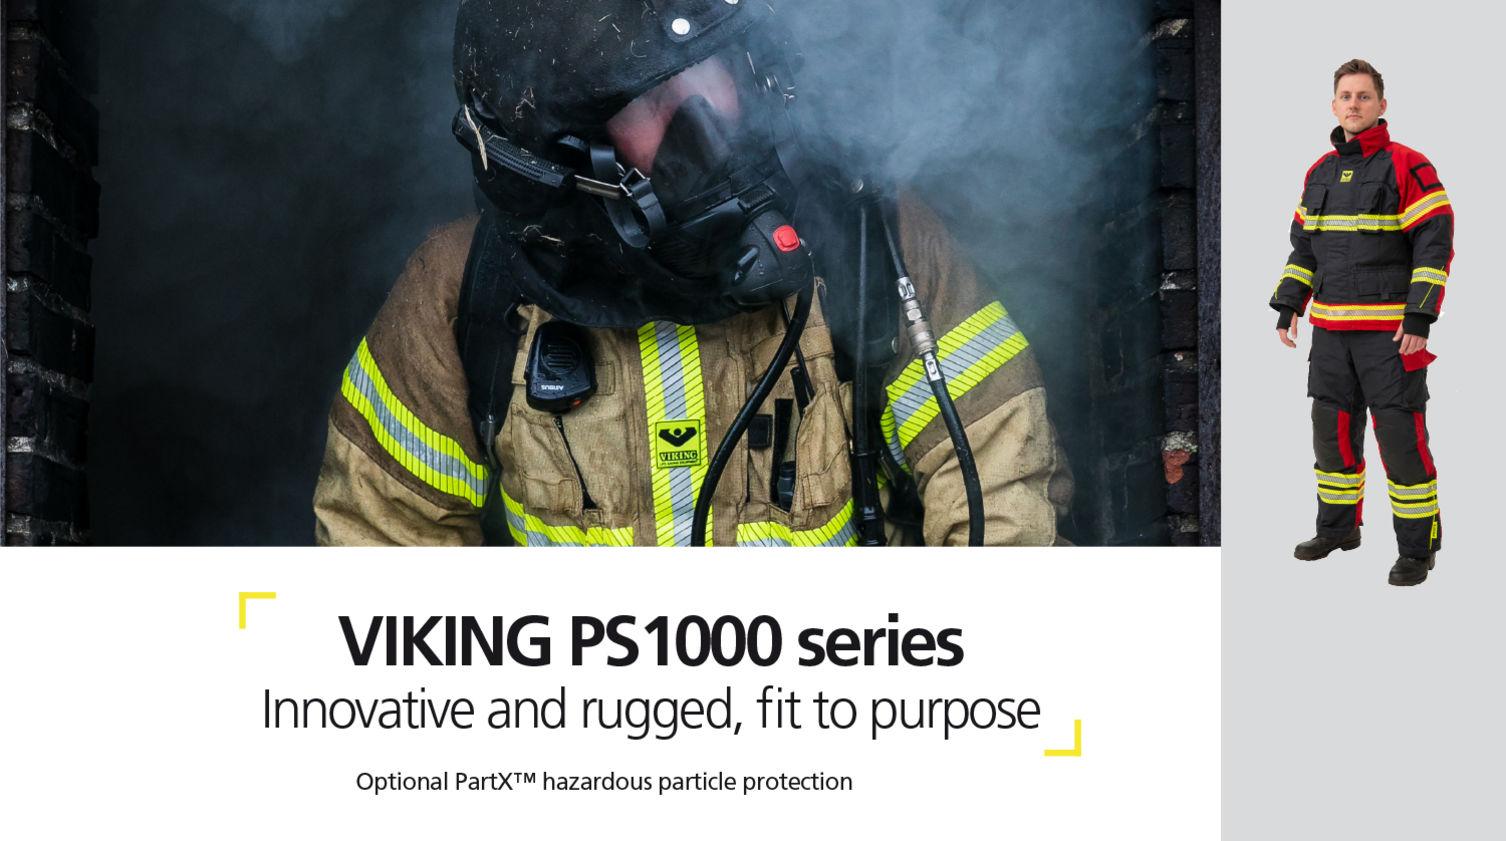 VIKING Ps1000 series